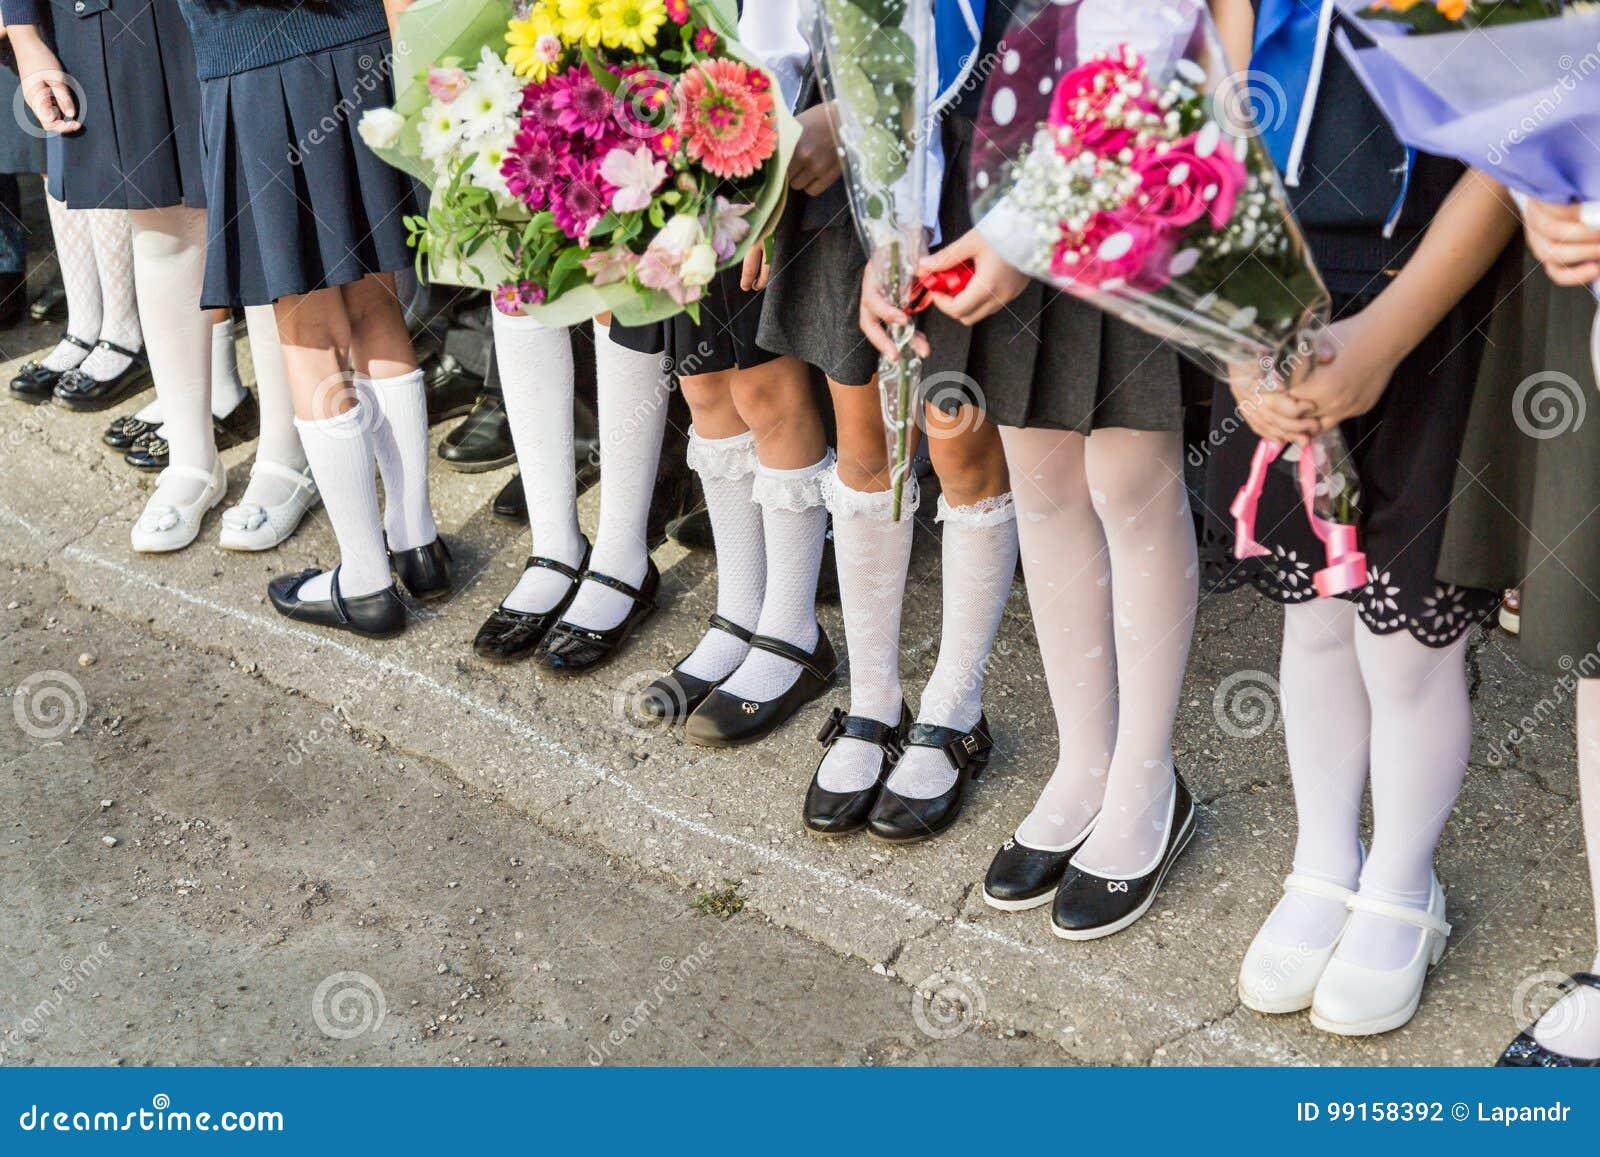 Agree, Girls white stockings school